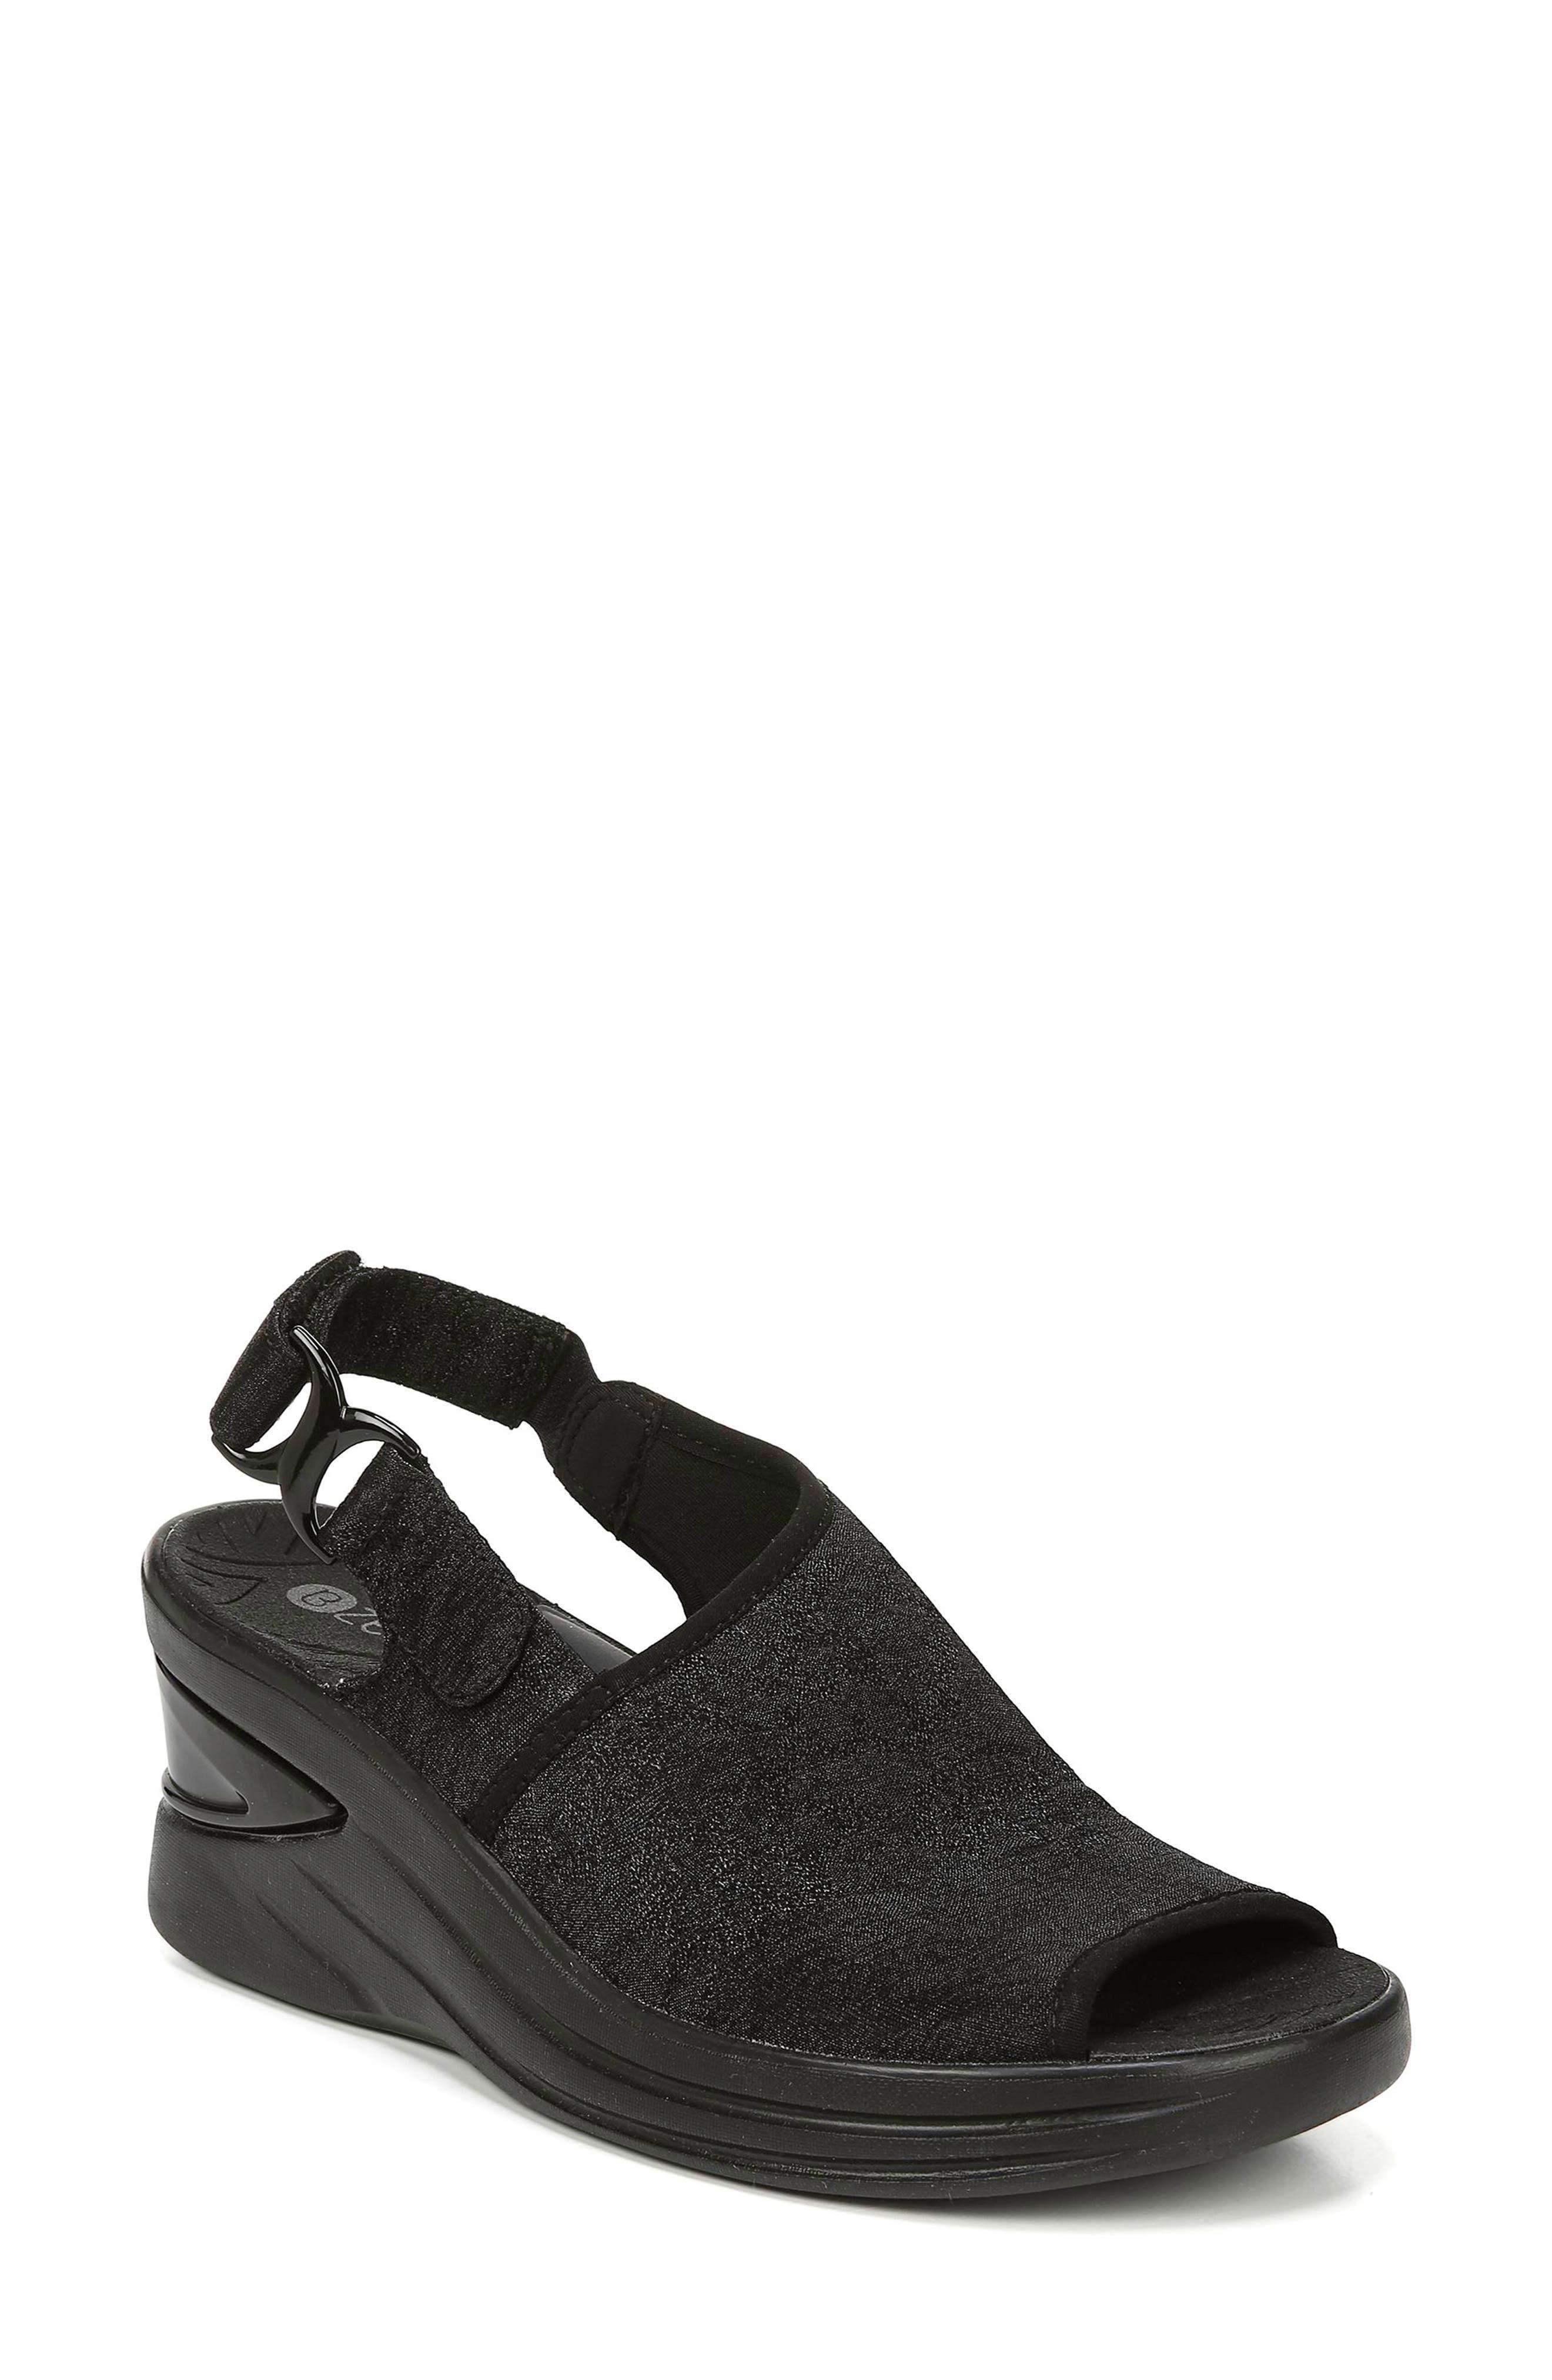 BZEES, Vivia Slingback Wedge Sandal, Main thumbnail 1, color, BLACK FABRIC